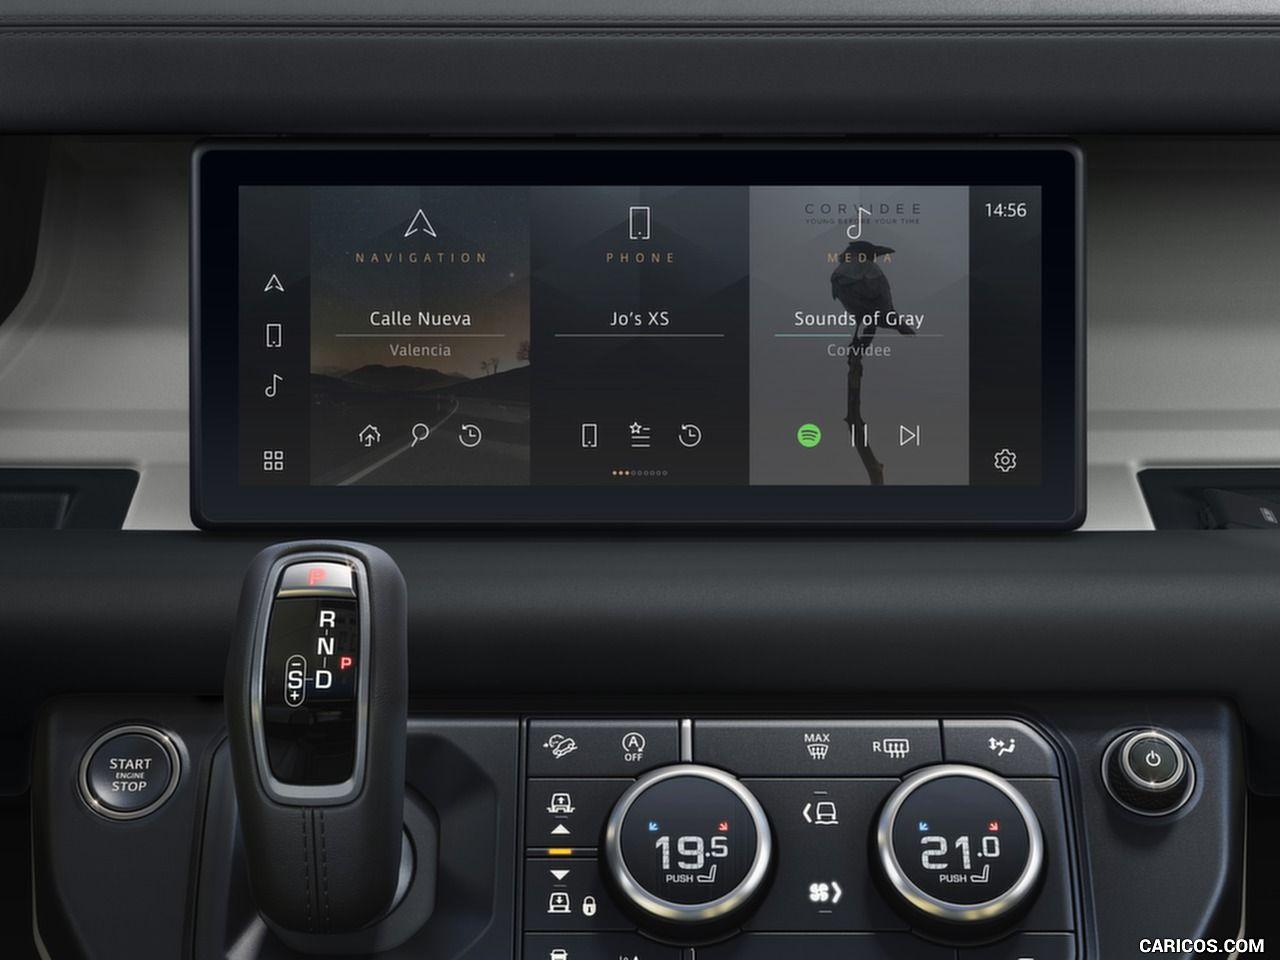 2020 Land Rover Defender 110(画像あり) 汽车